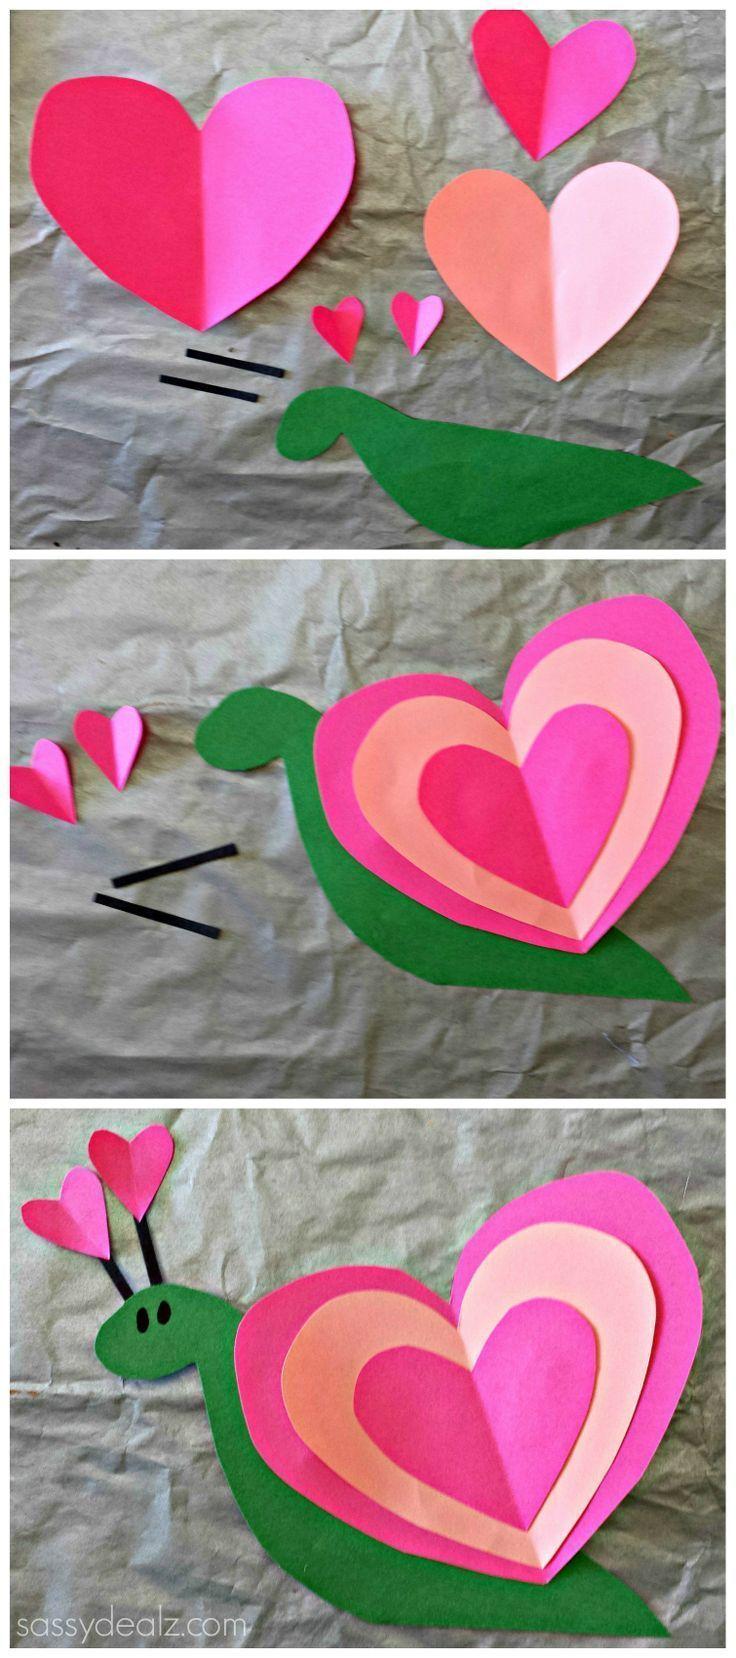 Heart Snail Craft For Kids (Valentine Art Project) #Heart shaped animal #DIY #Kids valentine | http://www.sassydealz.co...